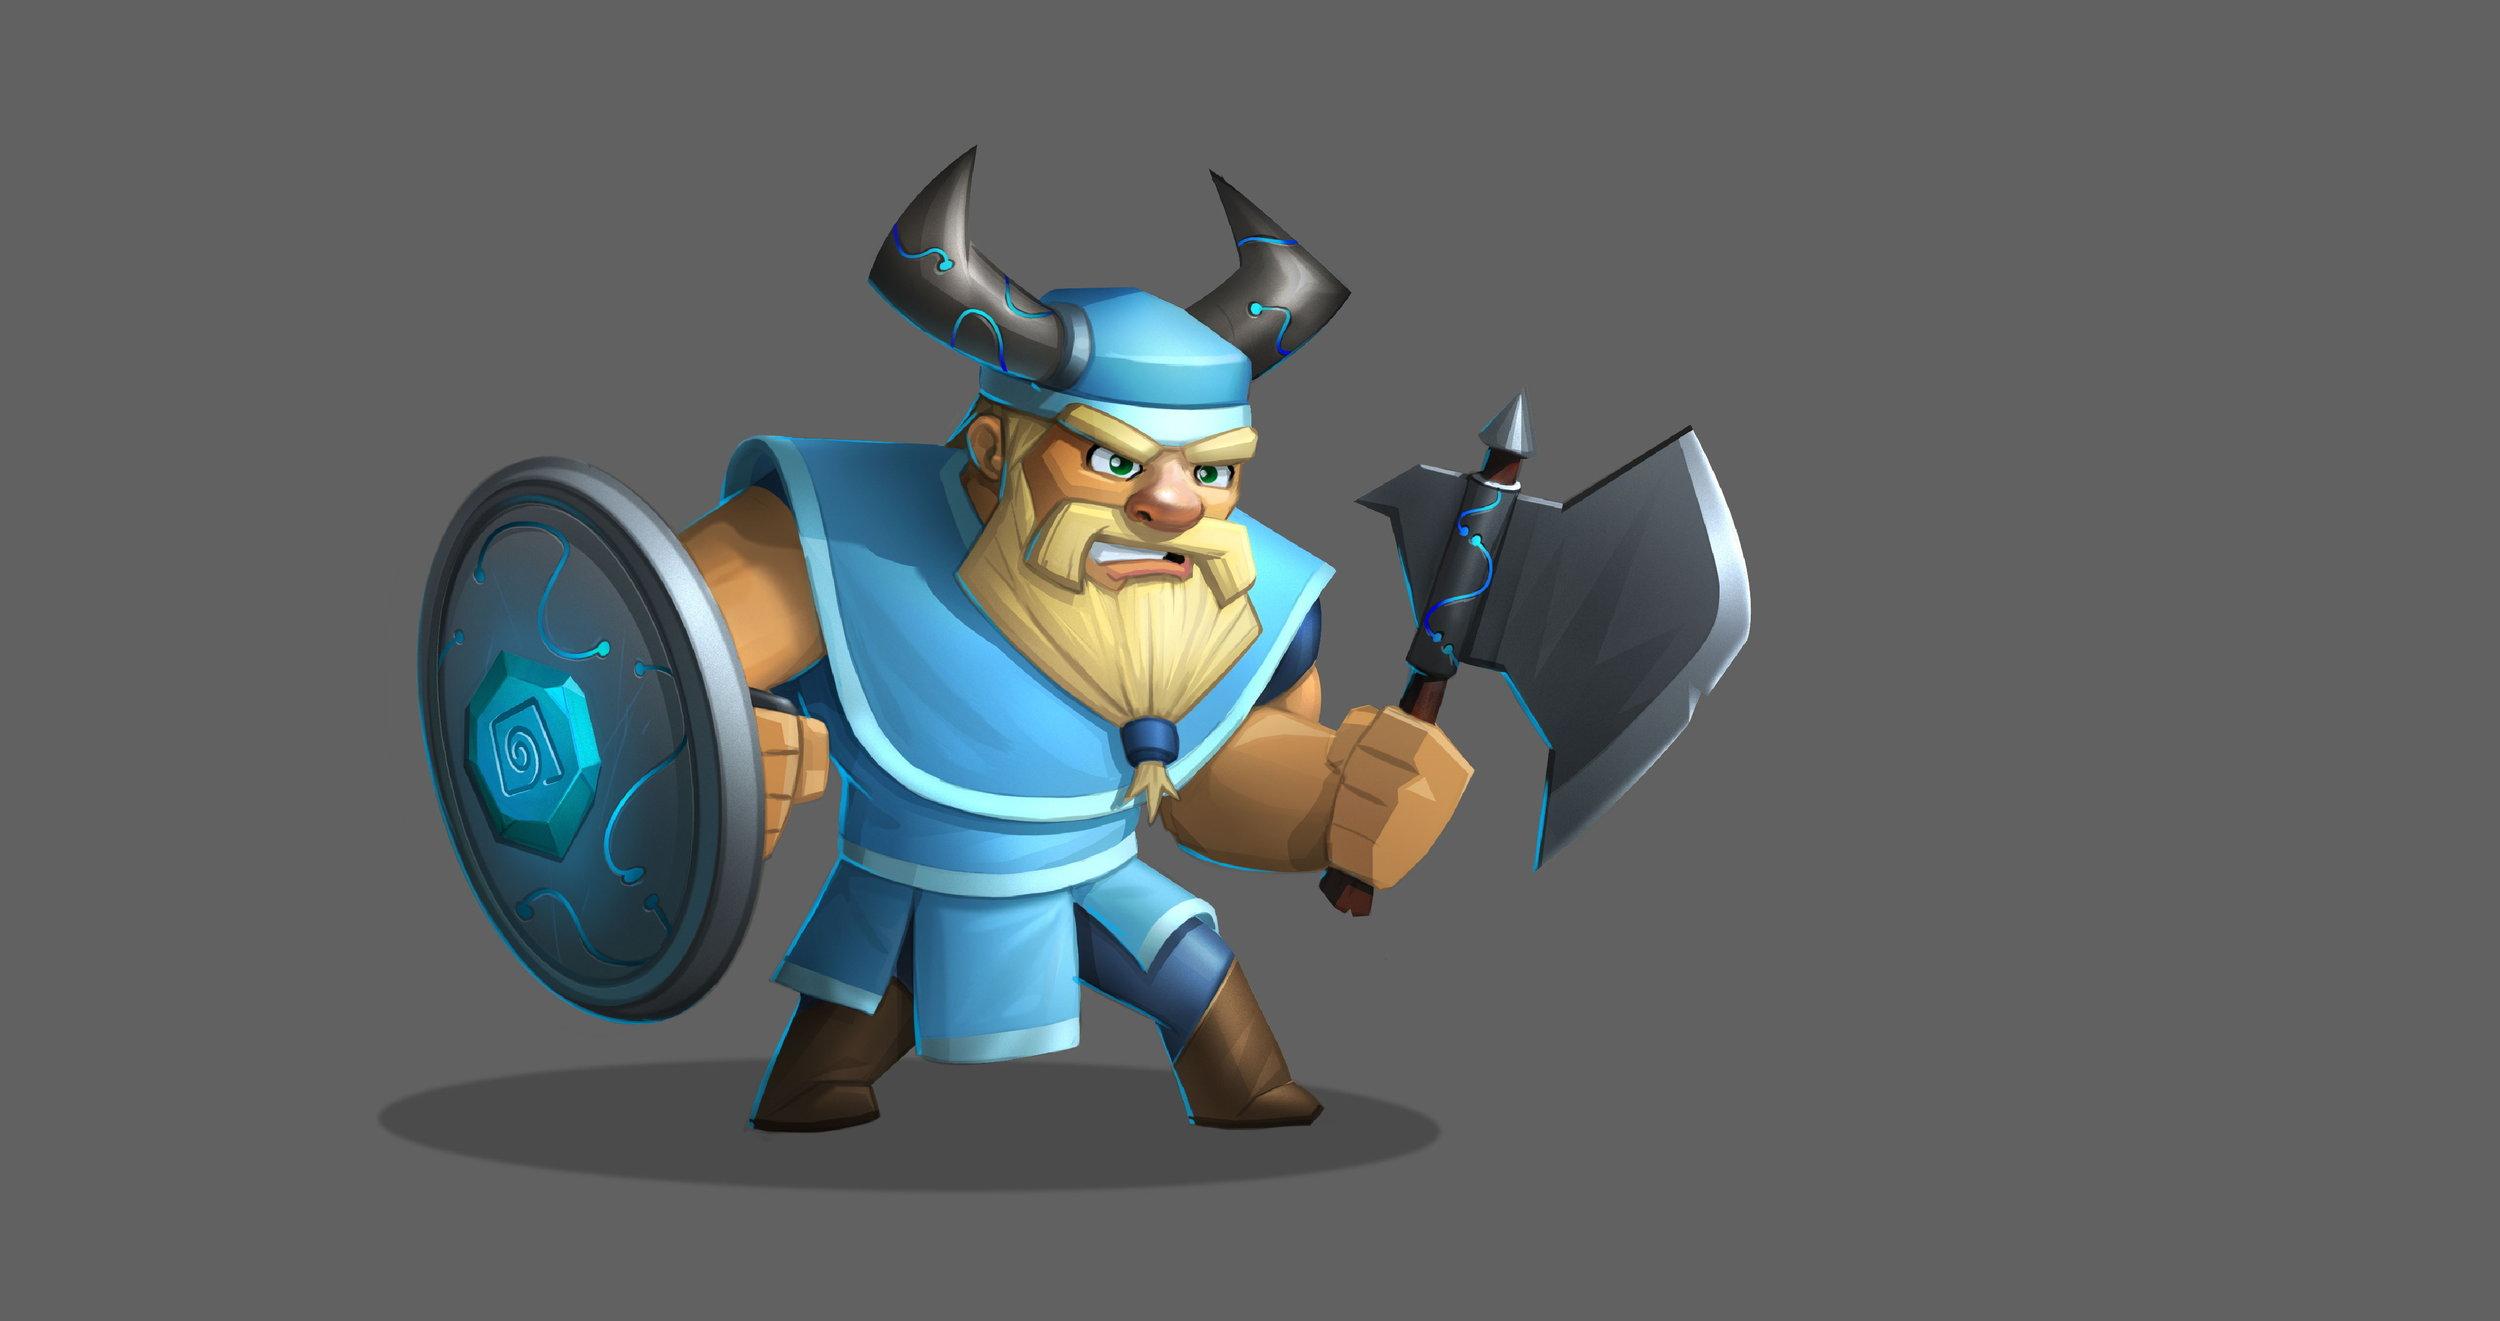 Boris the Warrior - Valiant & Vigorous. When not rigorously training in the art of axe wielding, Boris likes to bake and knit.